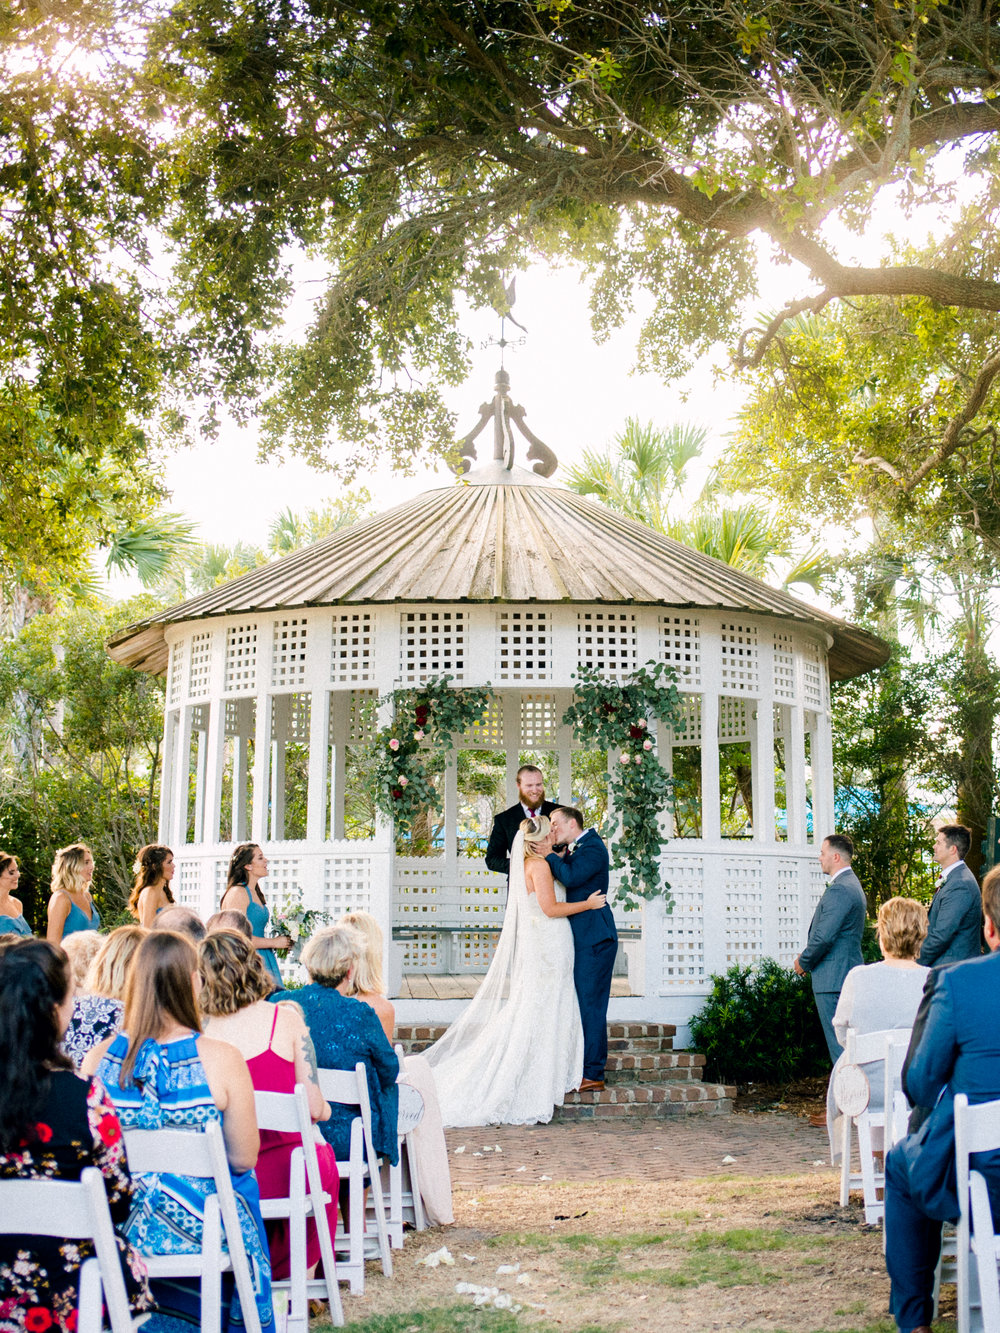 16saint_simons_island_wedding_megan_the_photographerIMG_9019.jpg